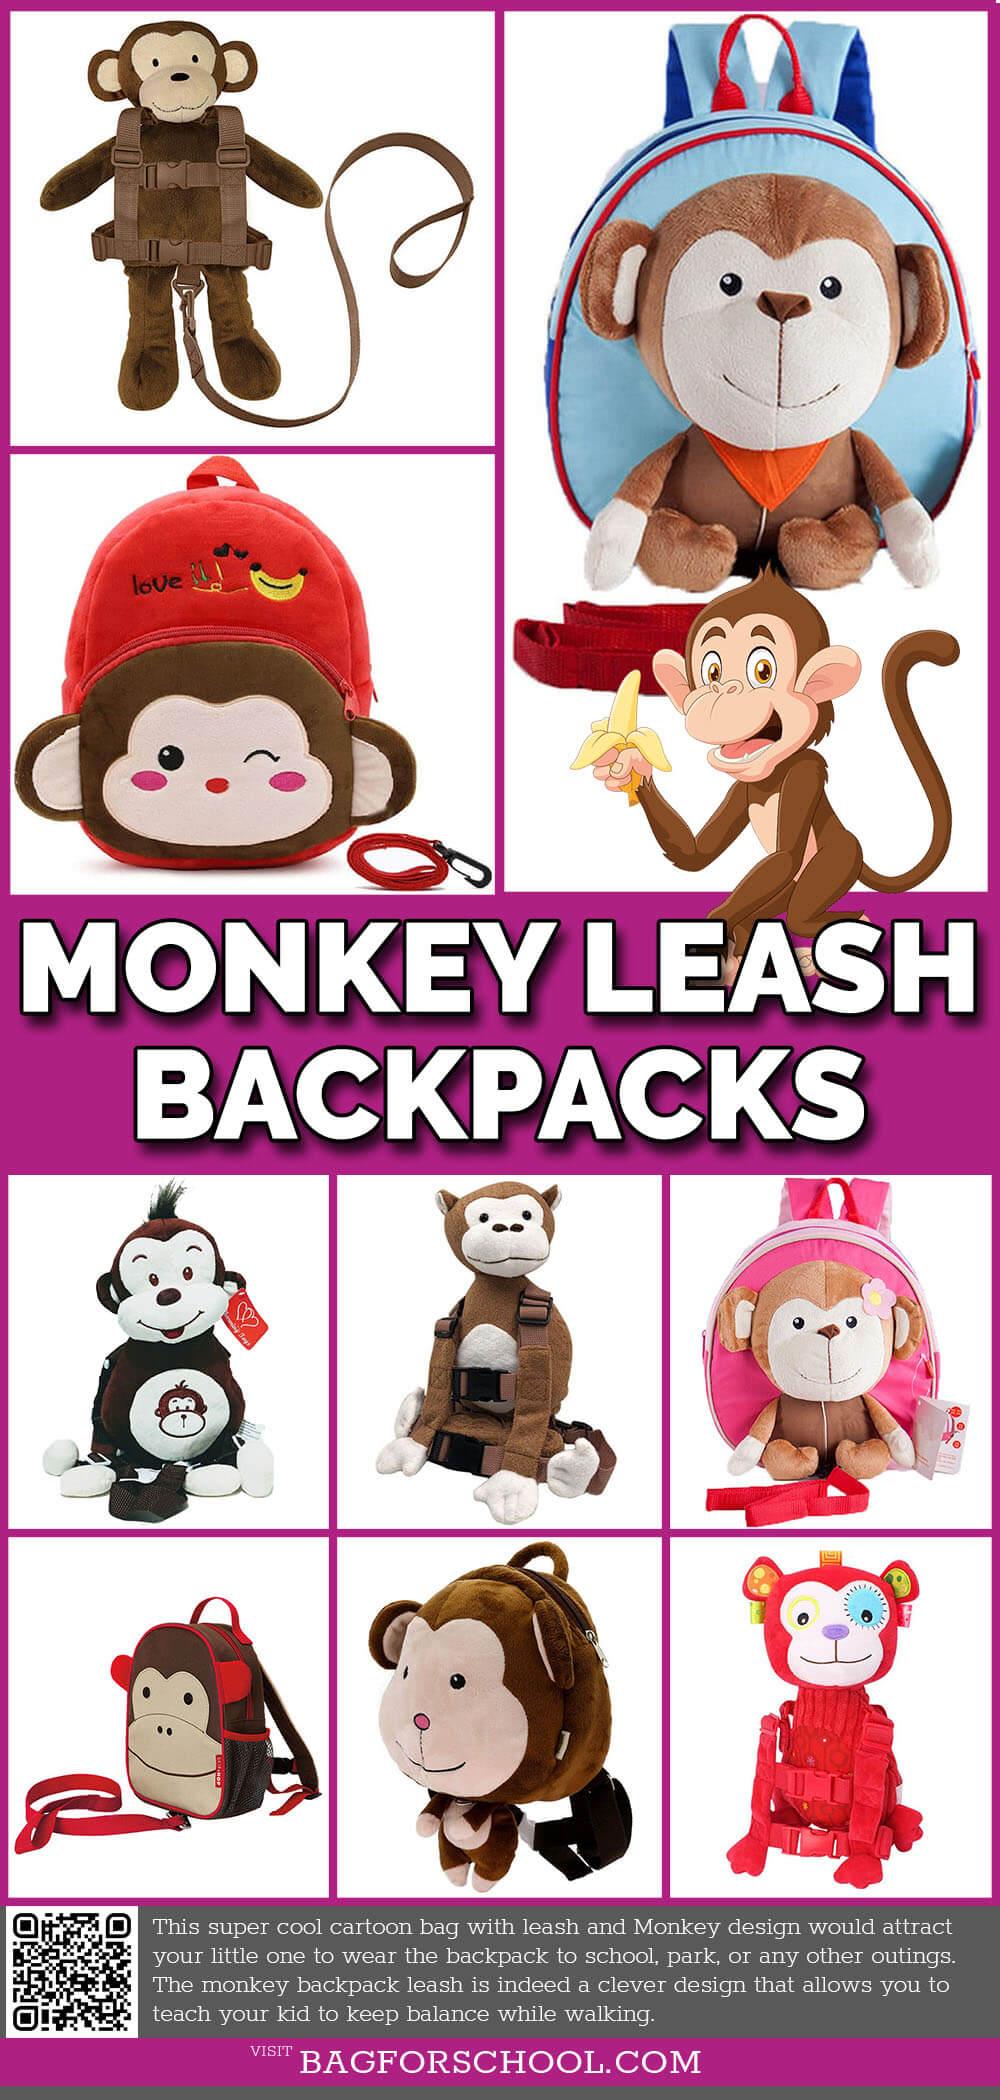 Monkey Leash Backpacks